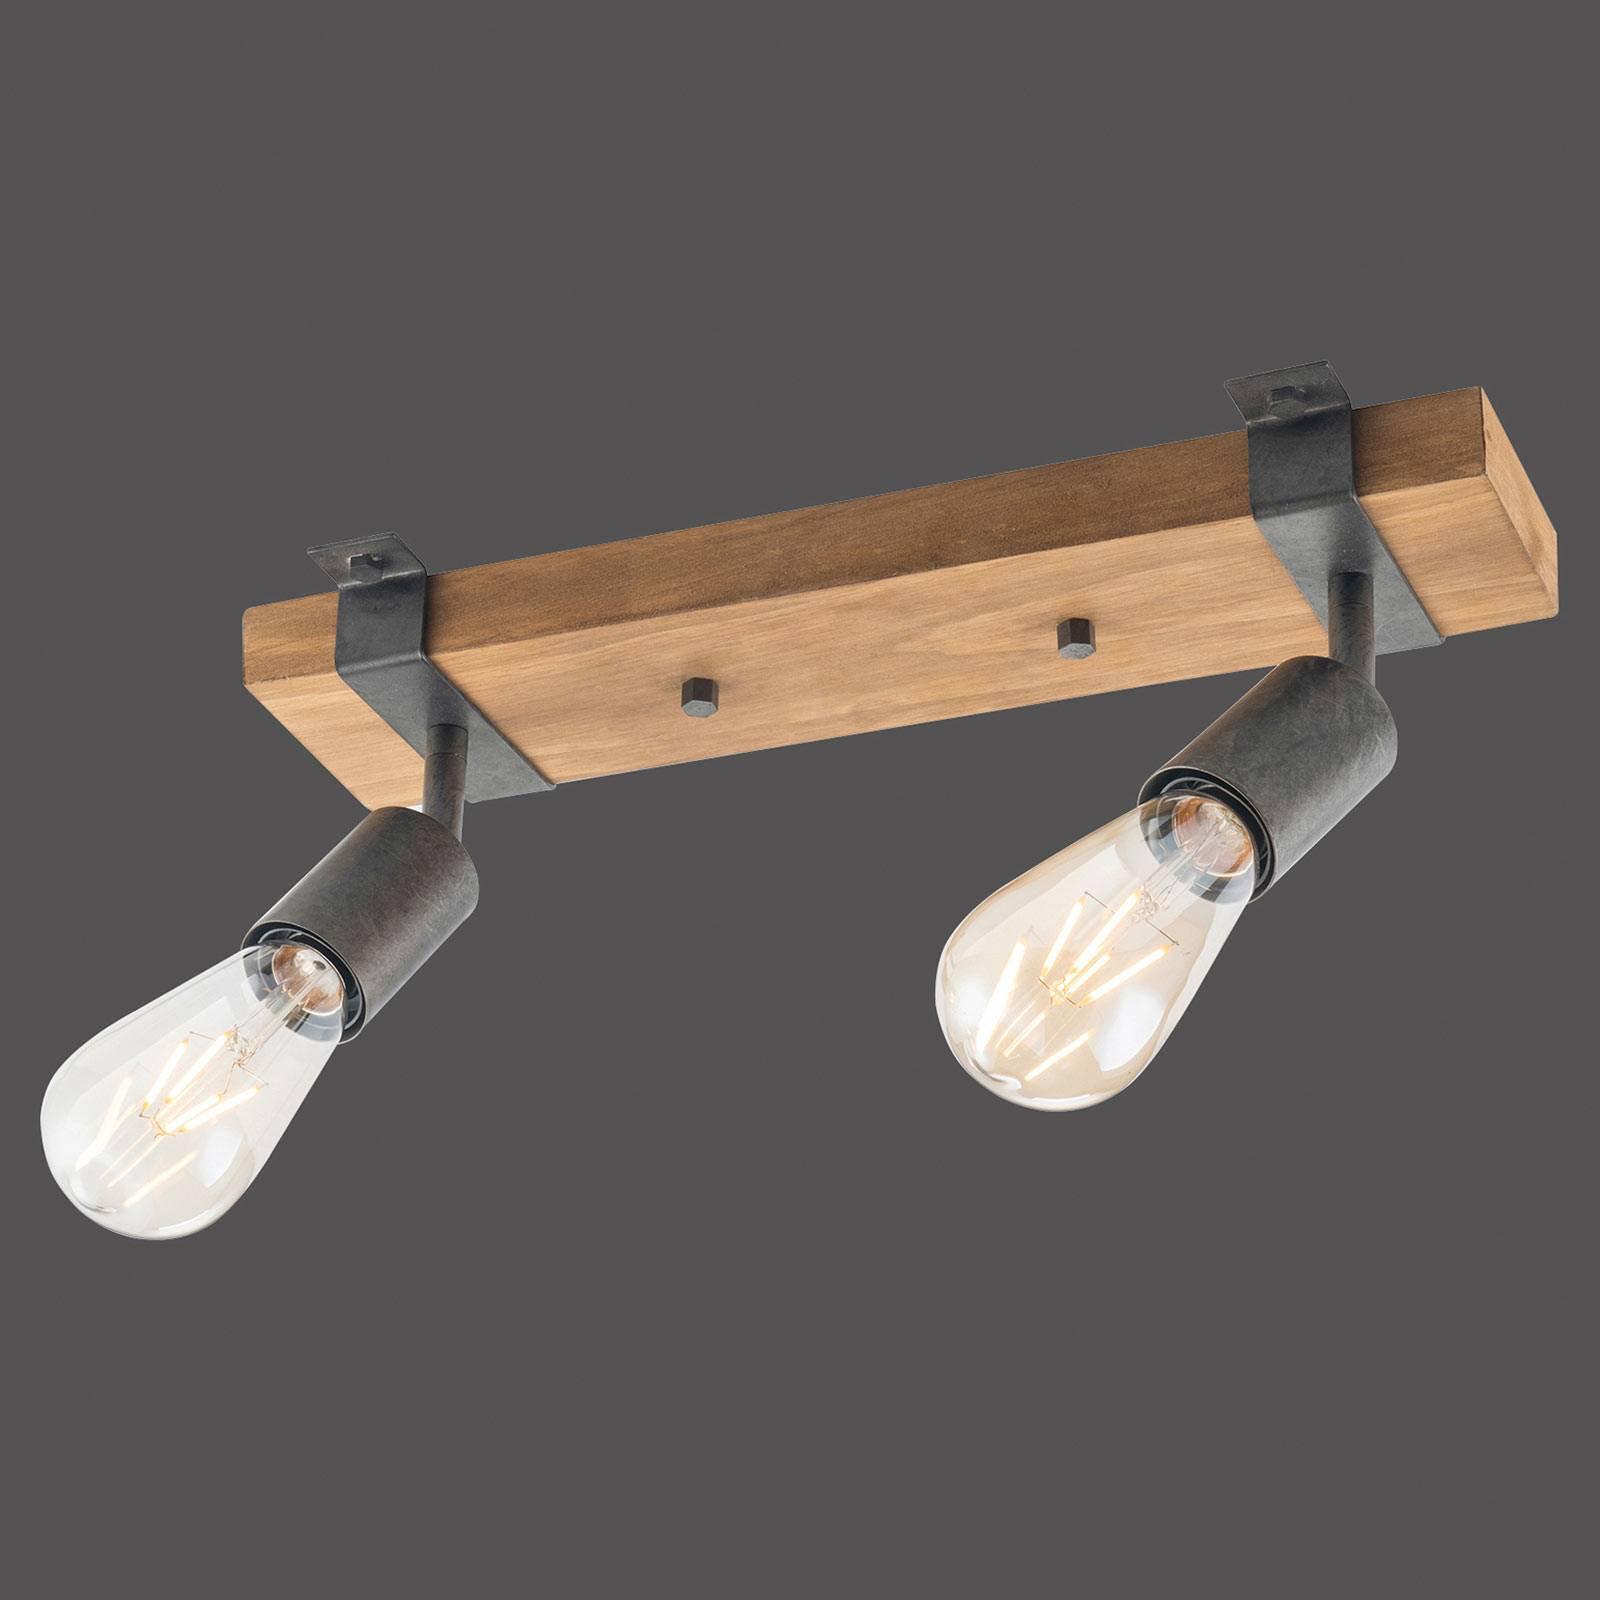 Slat taklampe, svingbar, 2 lyskilder